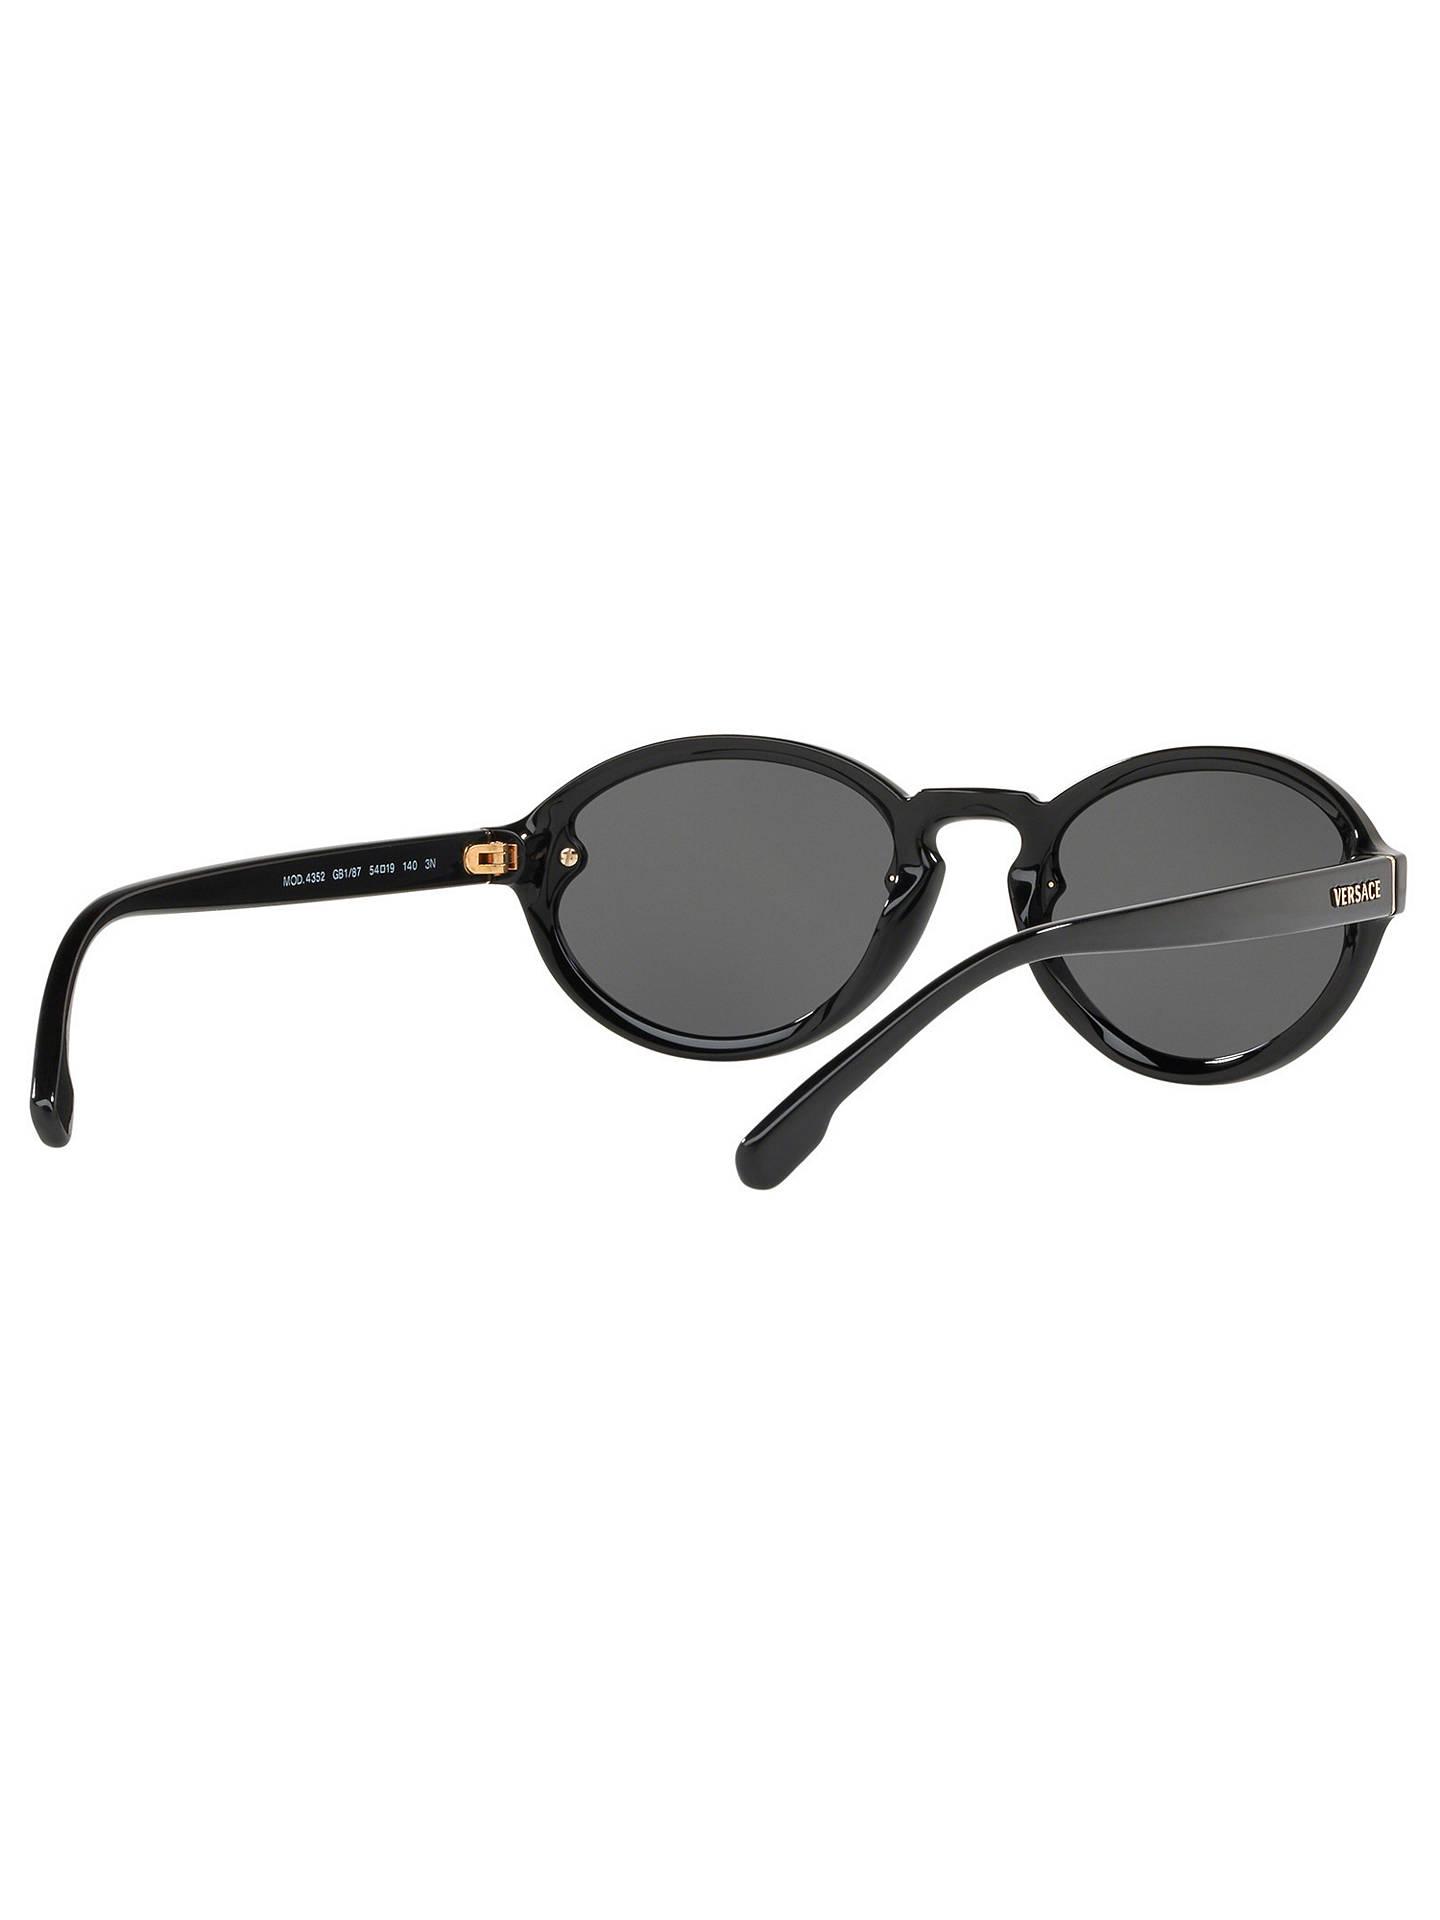 8365bfc73b67e Versace VE4352 Unisex Oval Sunglasses at John Lewis   Partners